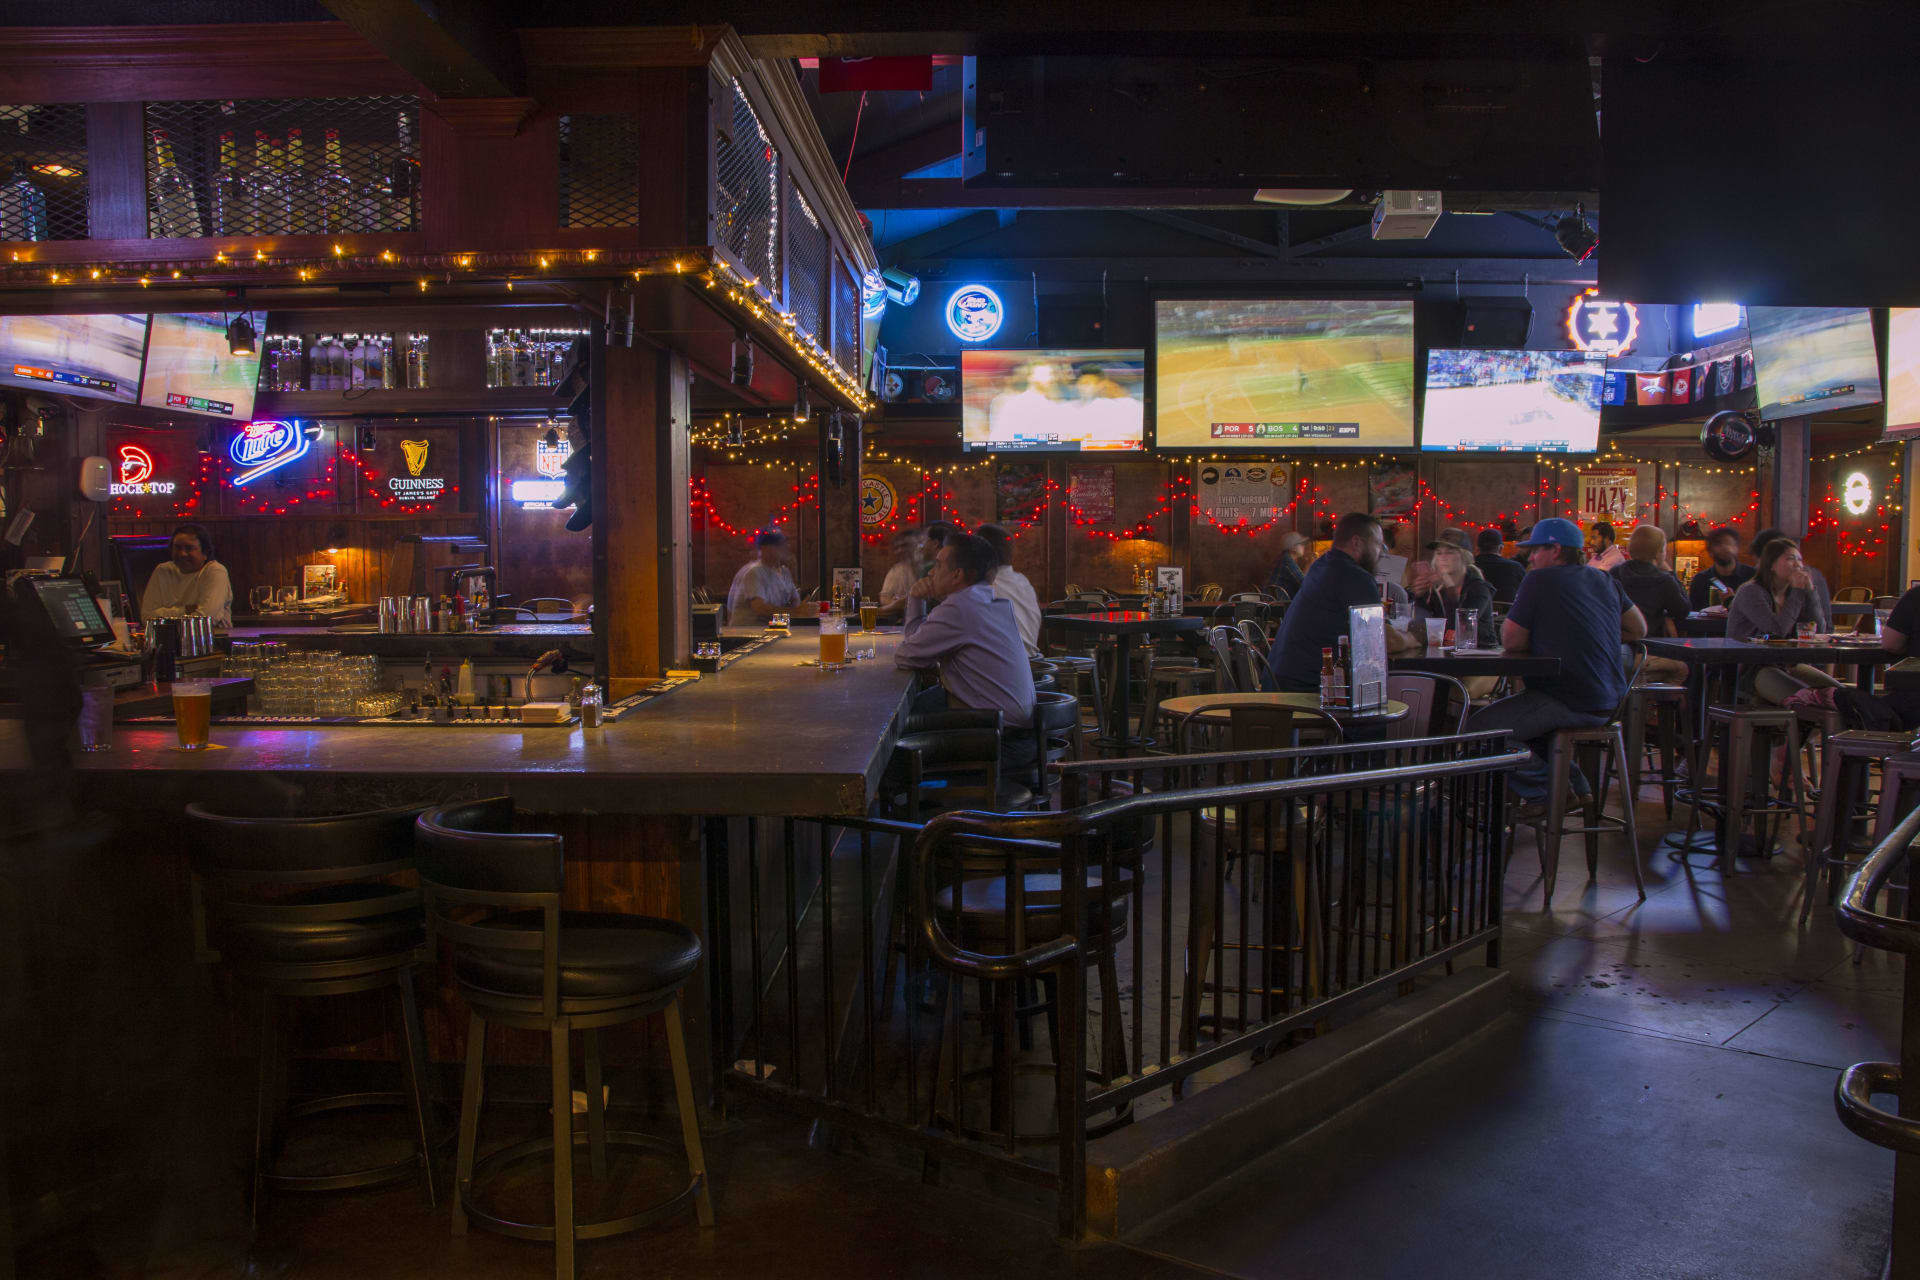 Bigs Bar